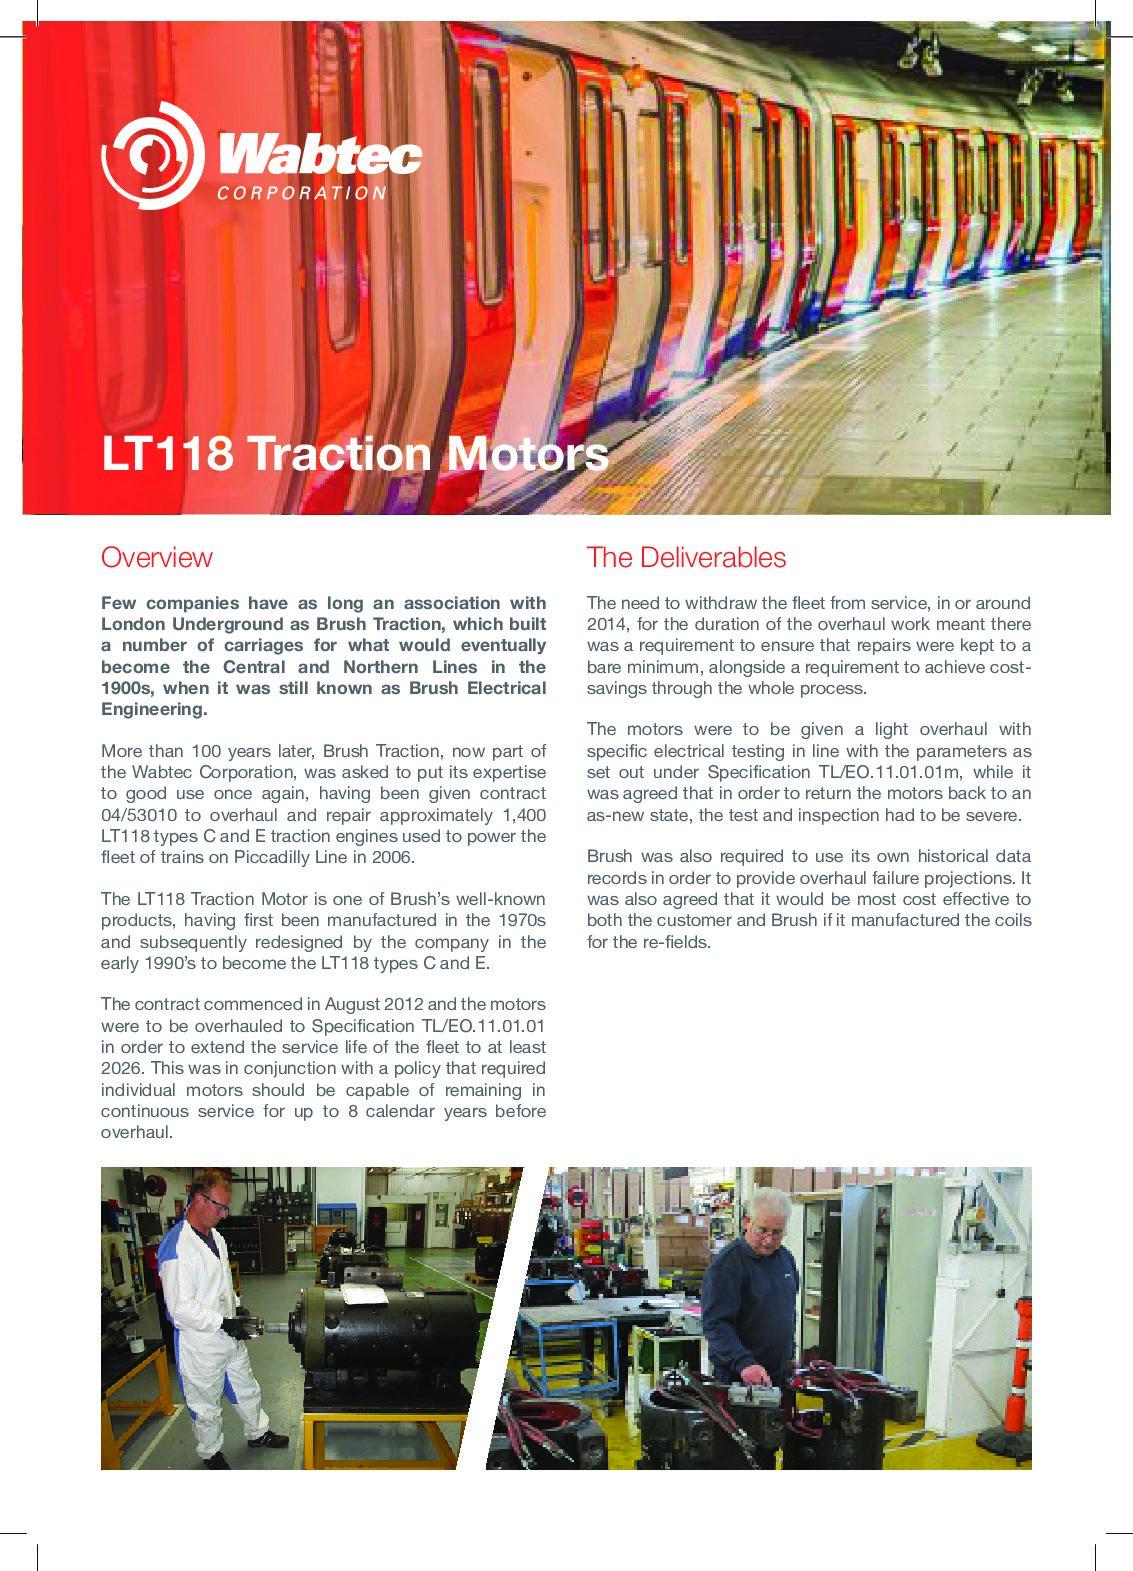 Wabtec Traction Motors Case Study